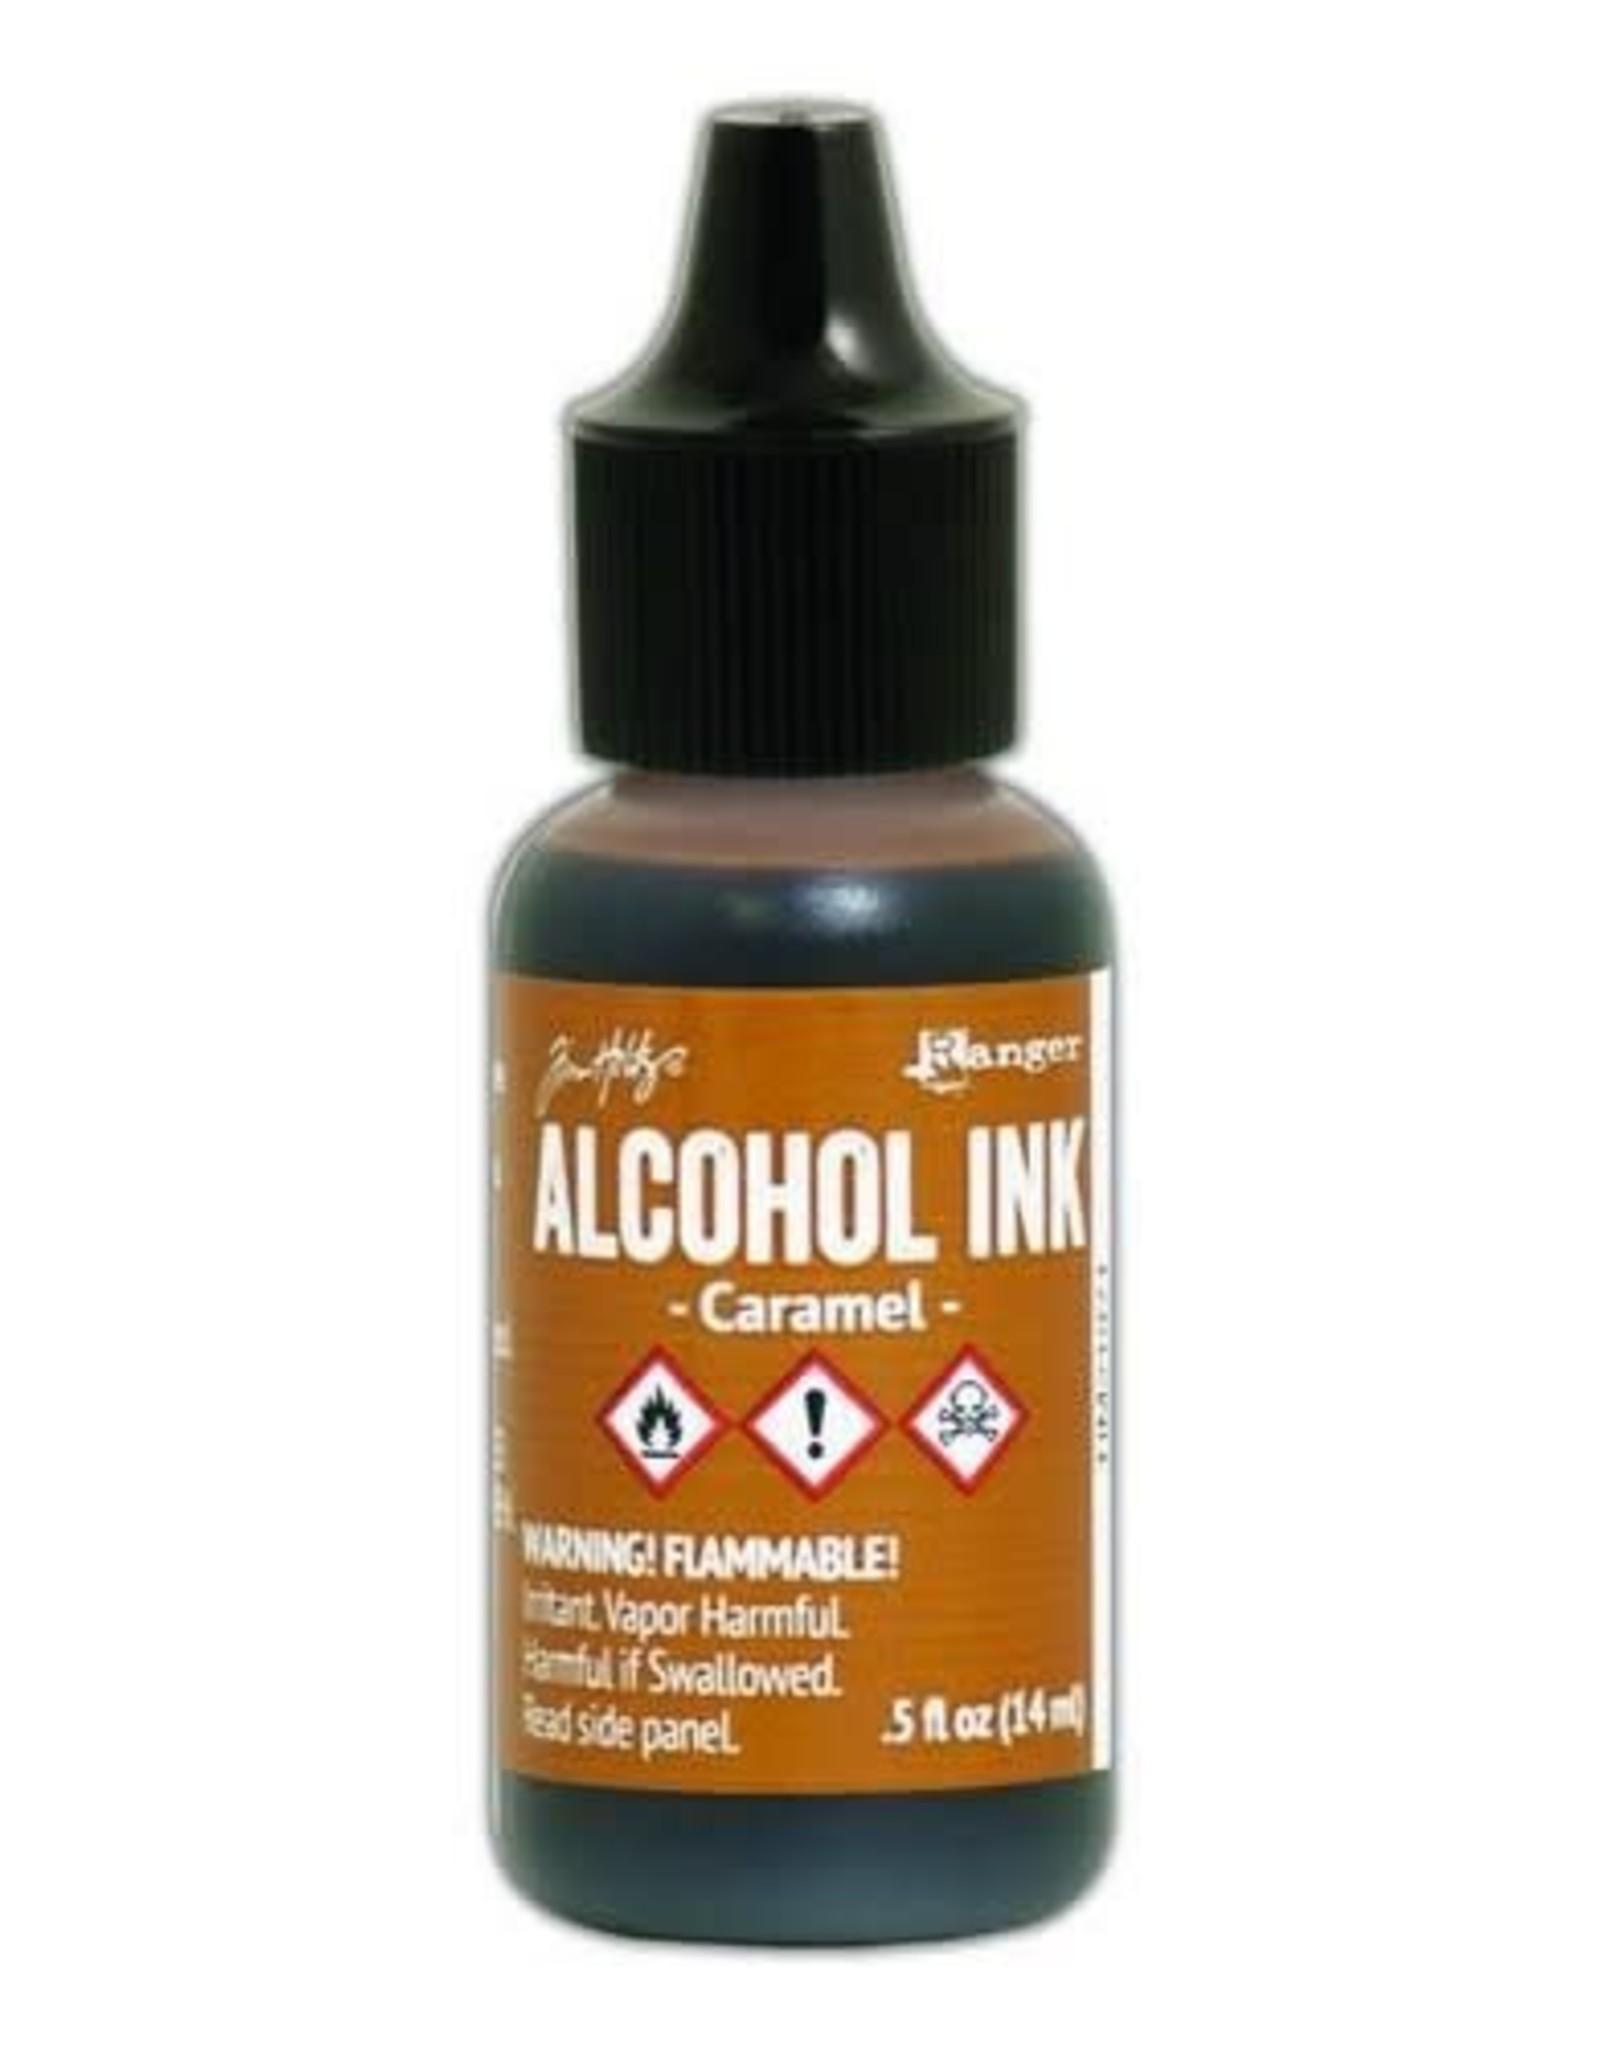 Ranger Ranger Alcohol Ink 15 ml - caramel TIM21971 Tim Holz